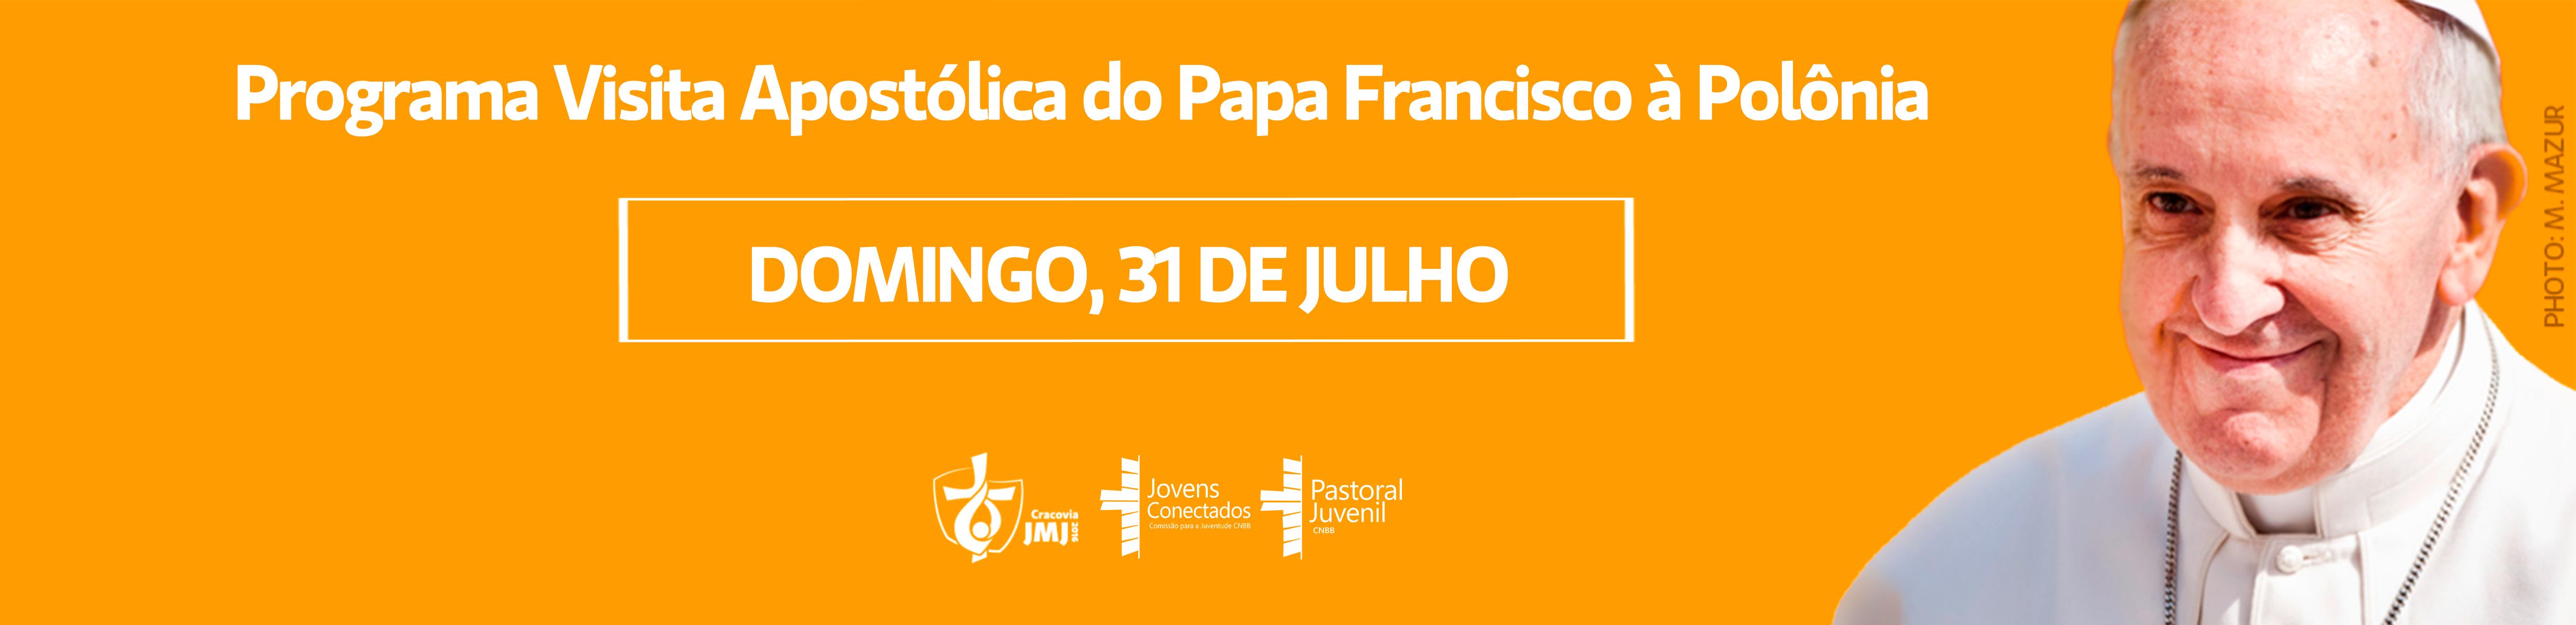 Domingo-31-de-julho---Papa-JMJ